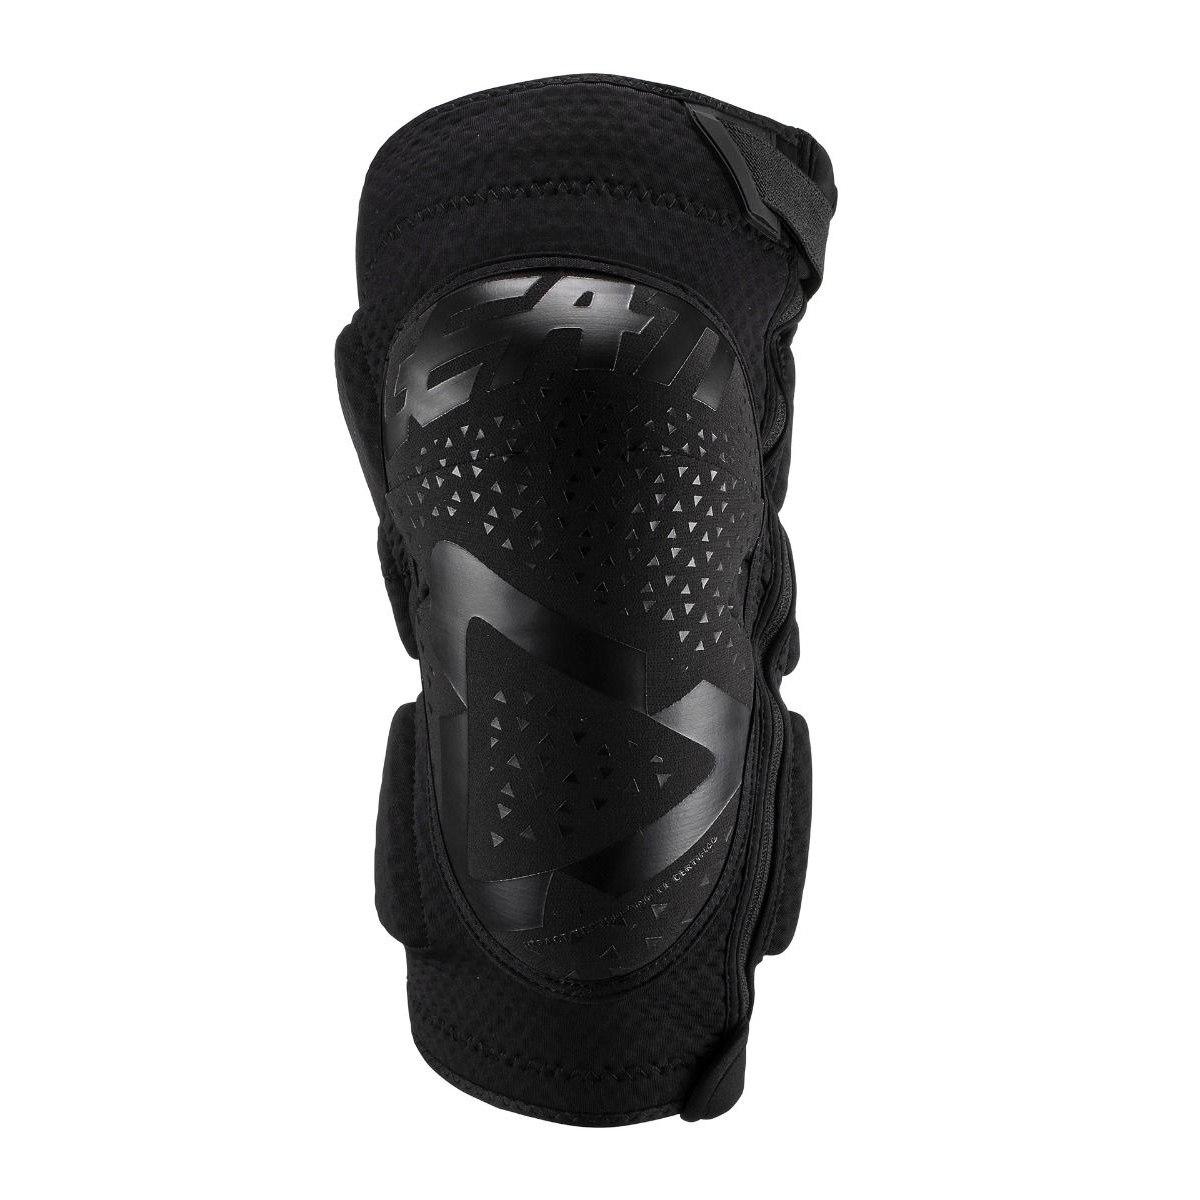 Leatt Knee Guard 3DF 5.0 Zip - black